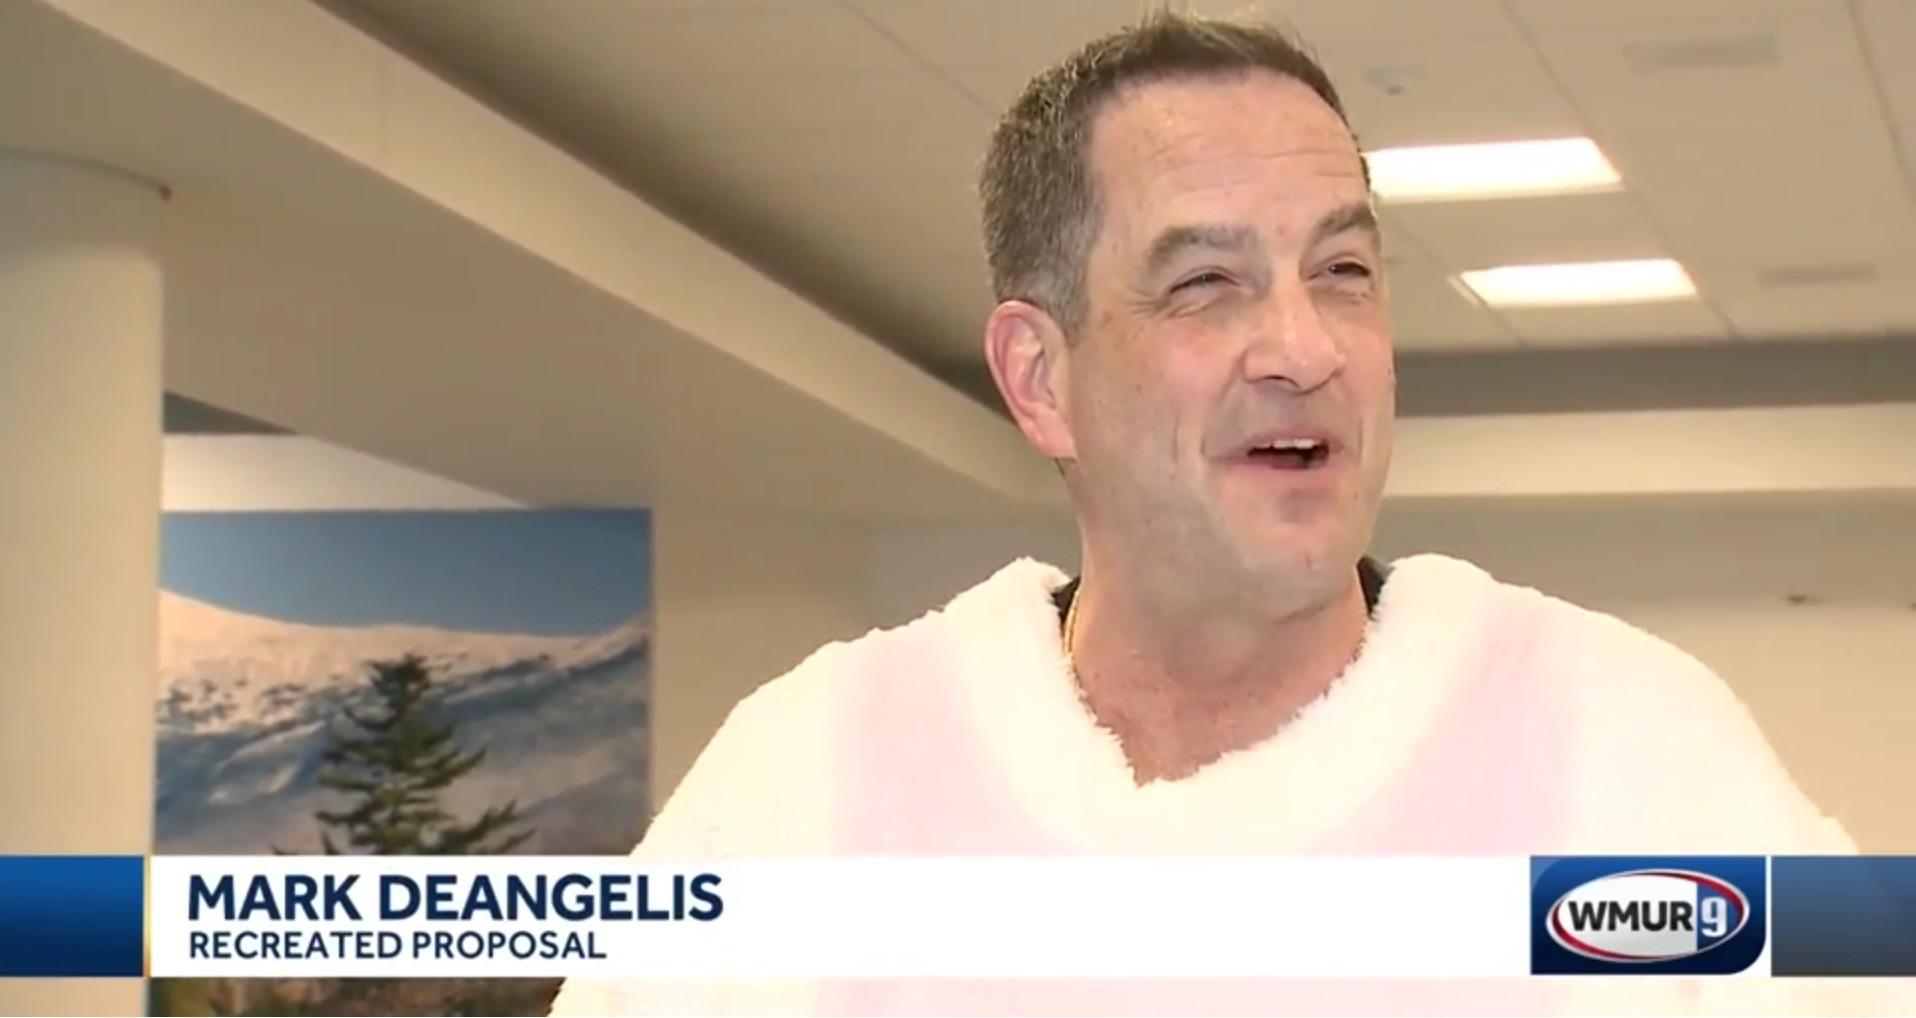 Mark Deangelis: Recreated Proposal